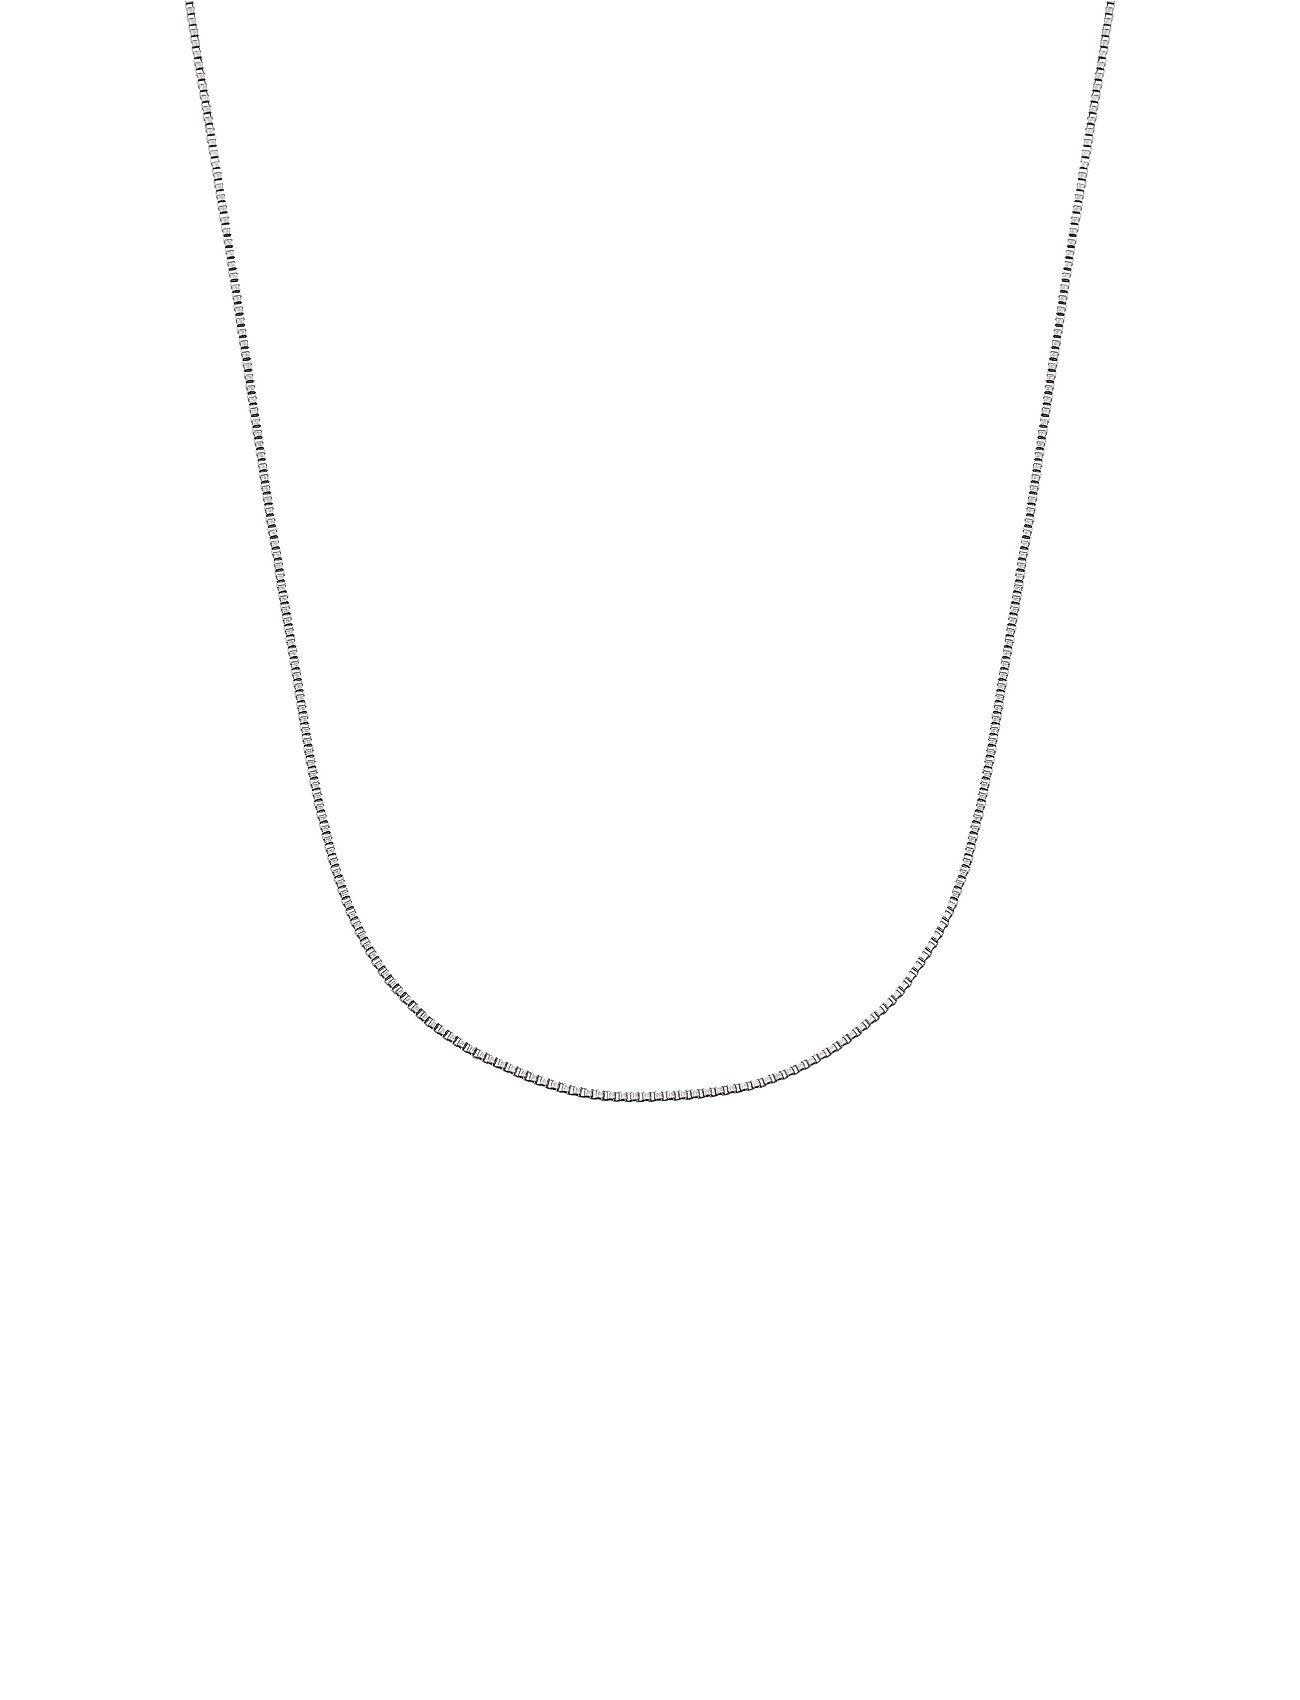 Edblad Charmentity Chain Box 80 Cm Steel Accessories Jewellery Necklaces Dainty Necklaces Hopea Edblad